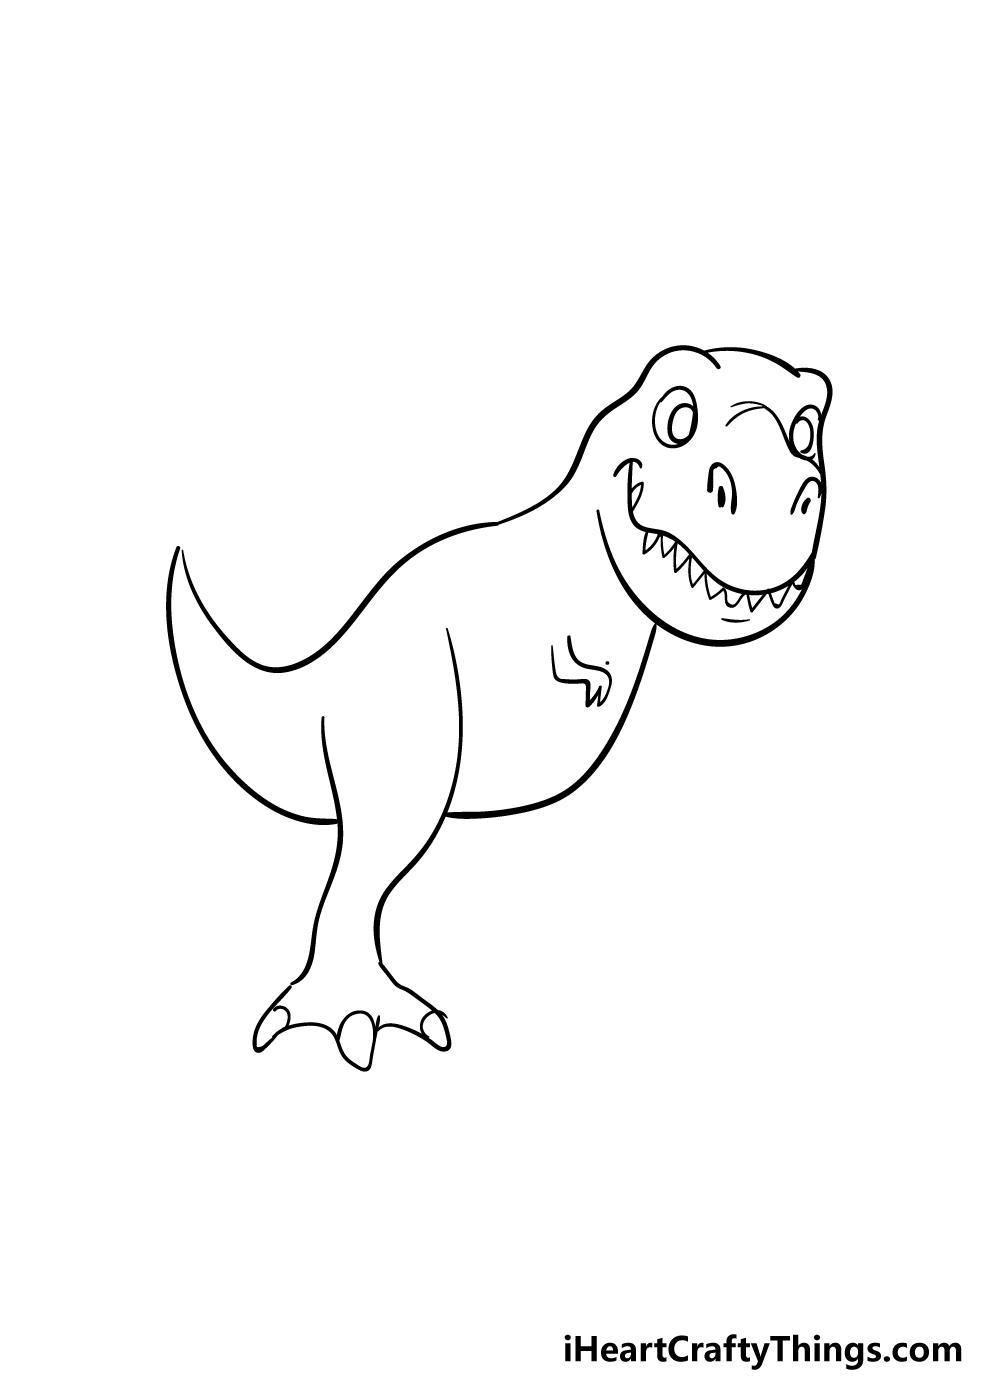 t-rex drawing step 5